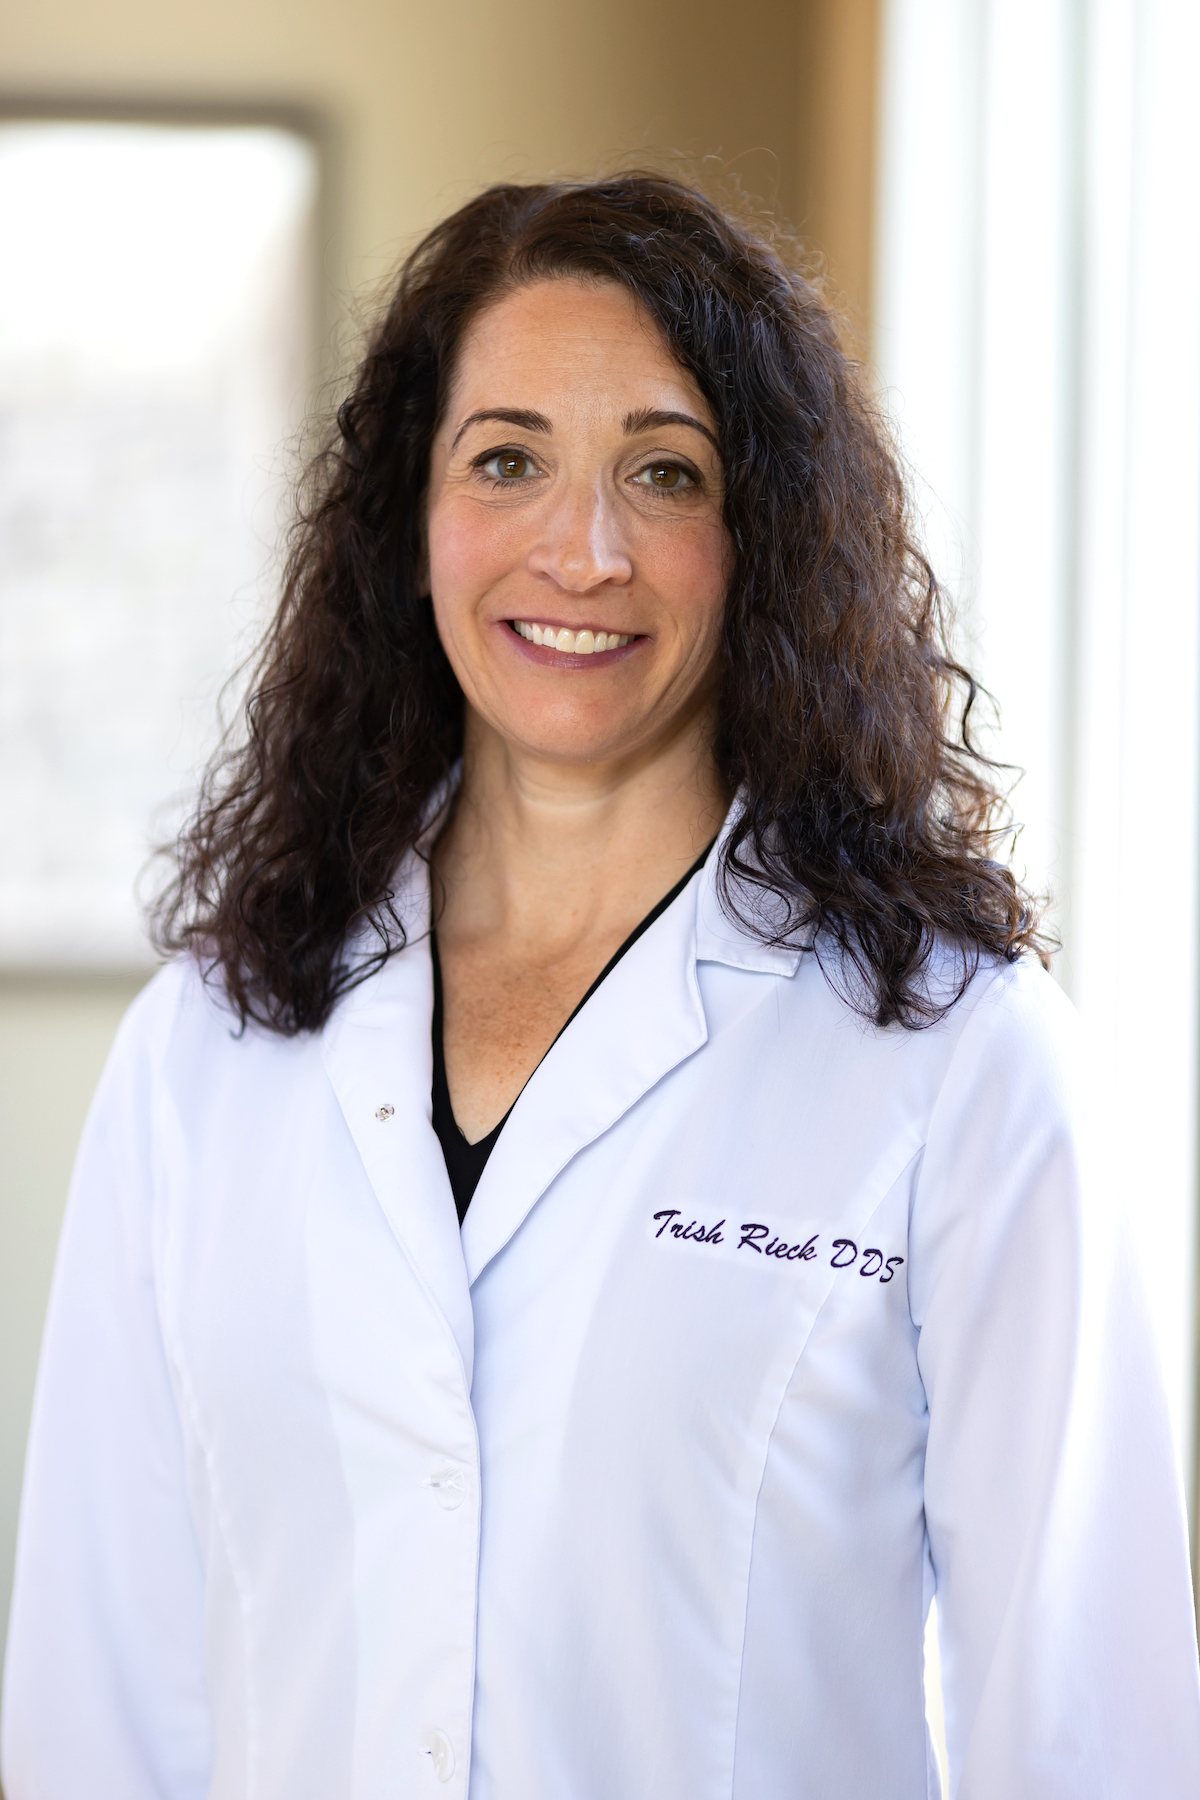 Dr-Trish-Rieck-St-Paul-dentist